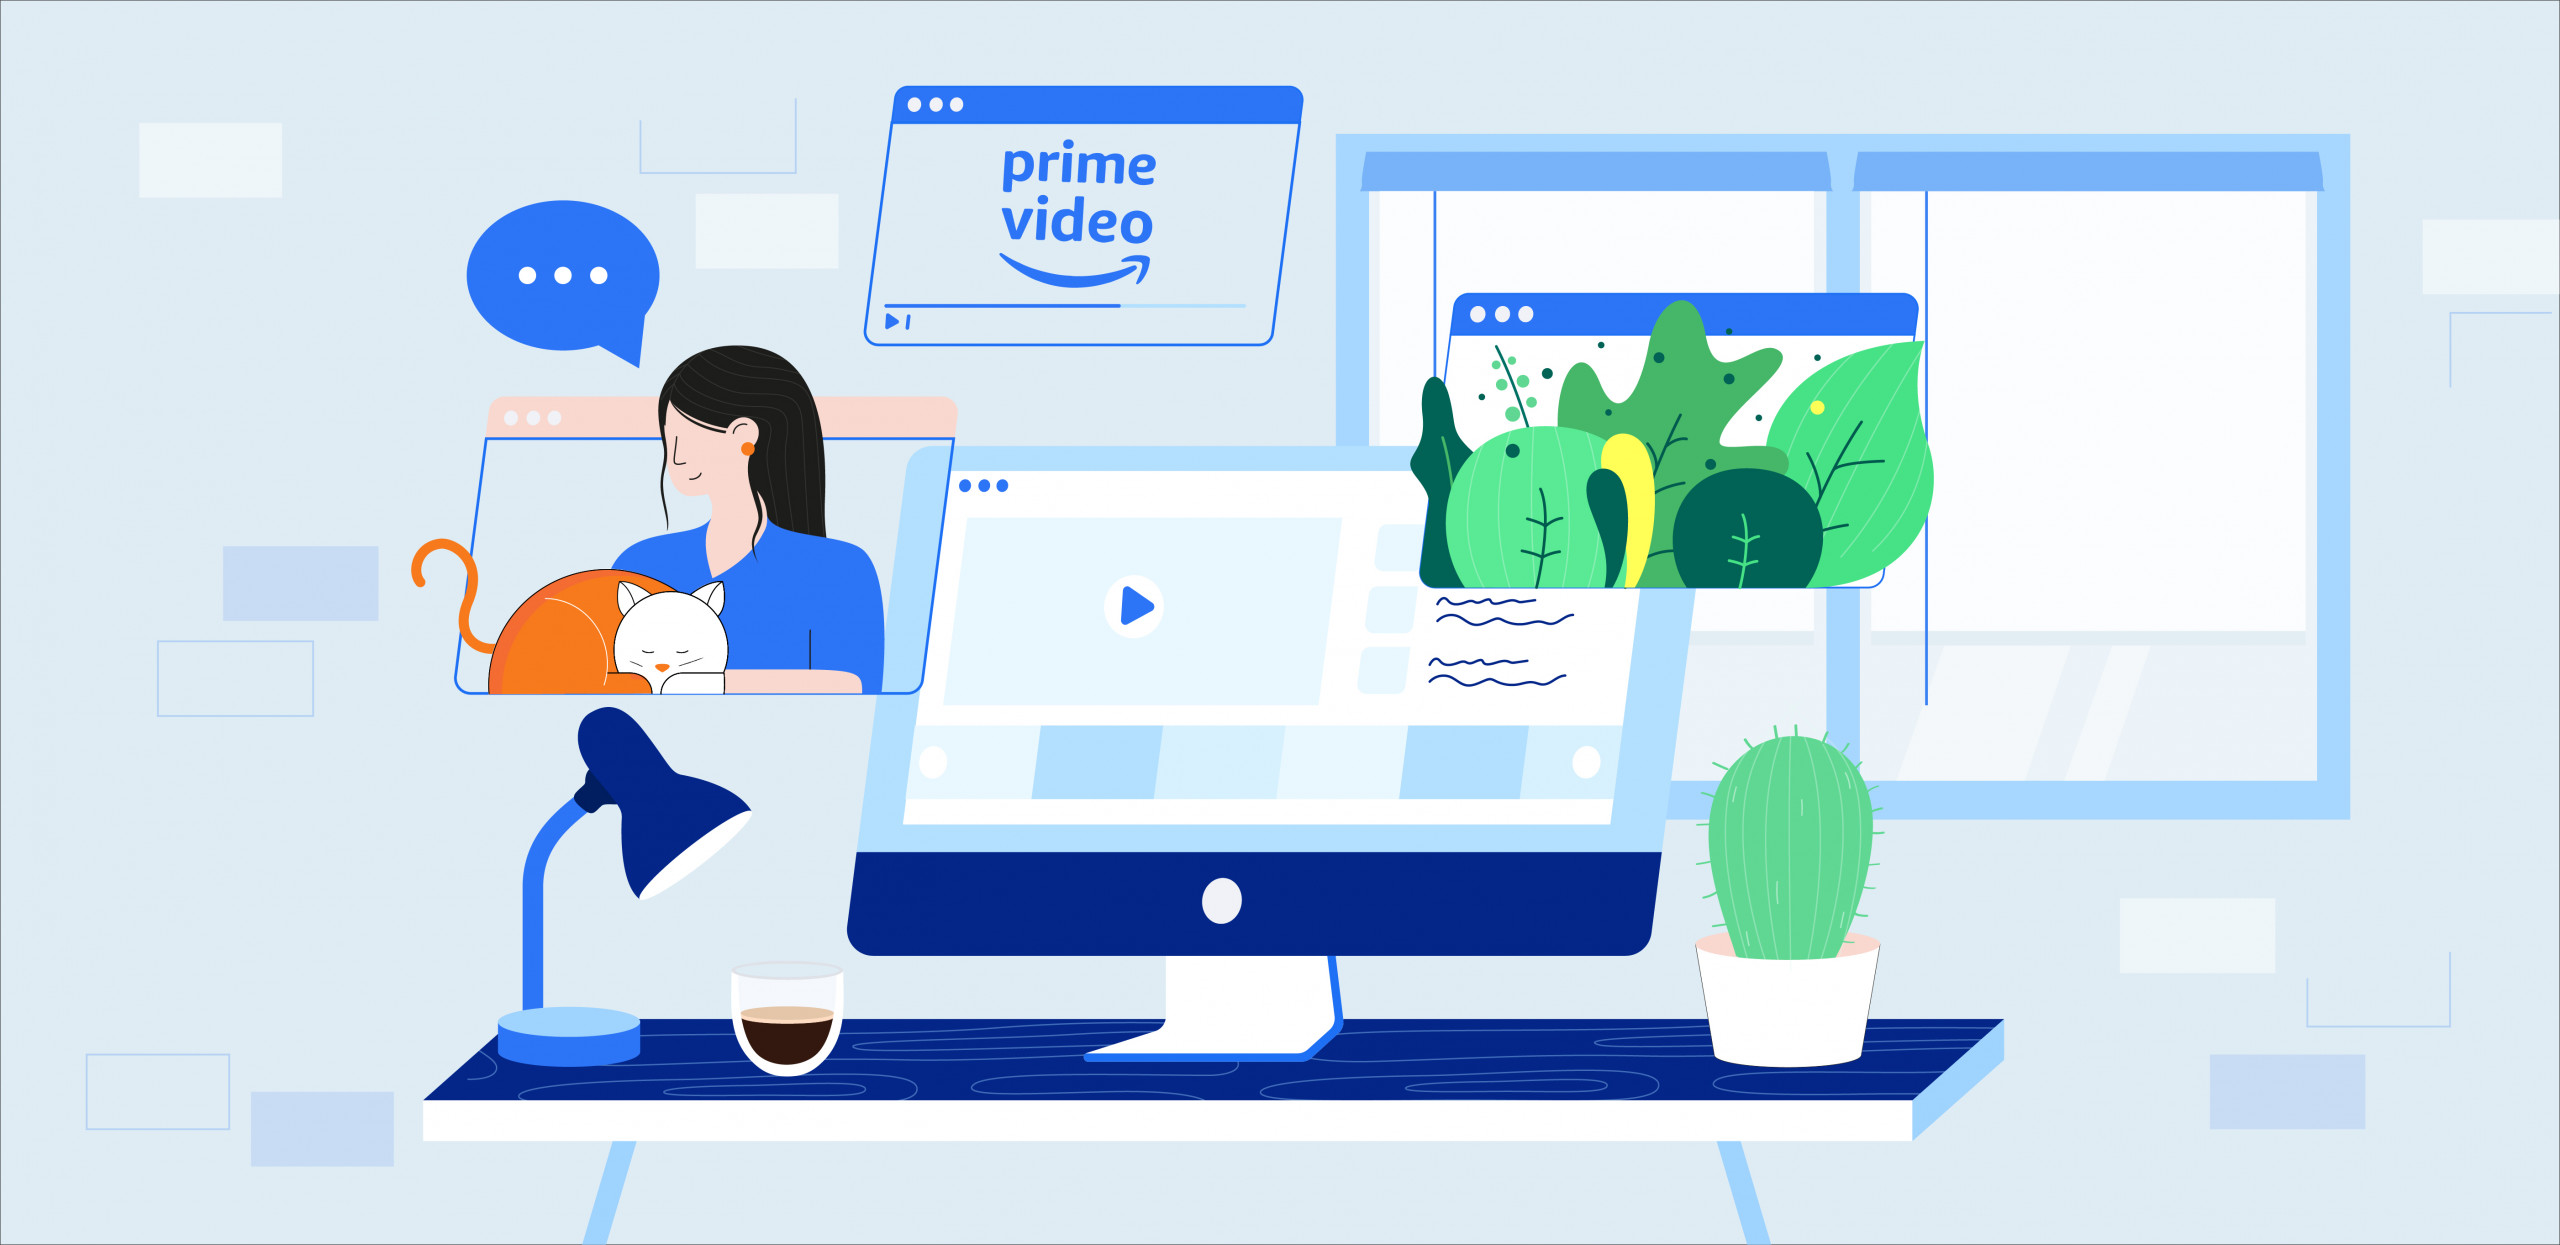 amazon-prime-video-vpn